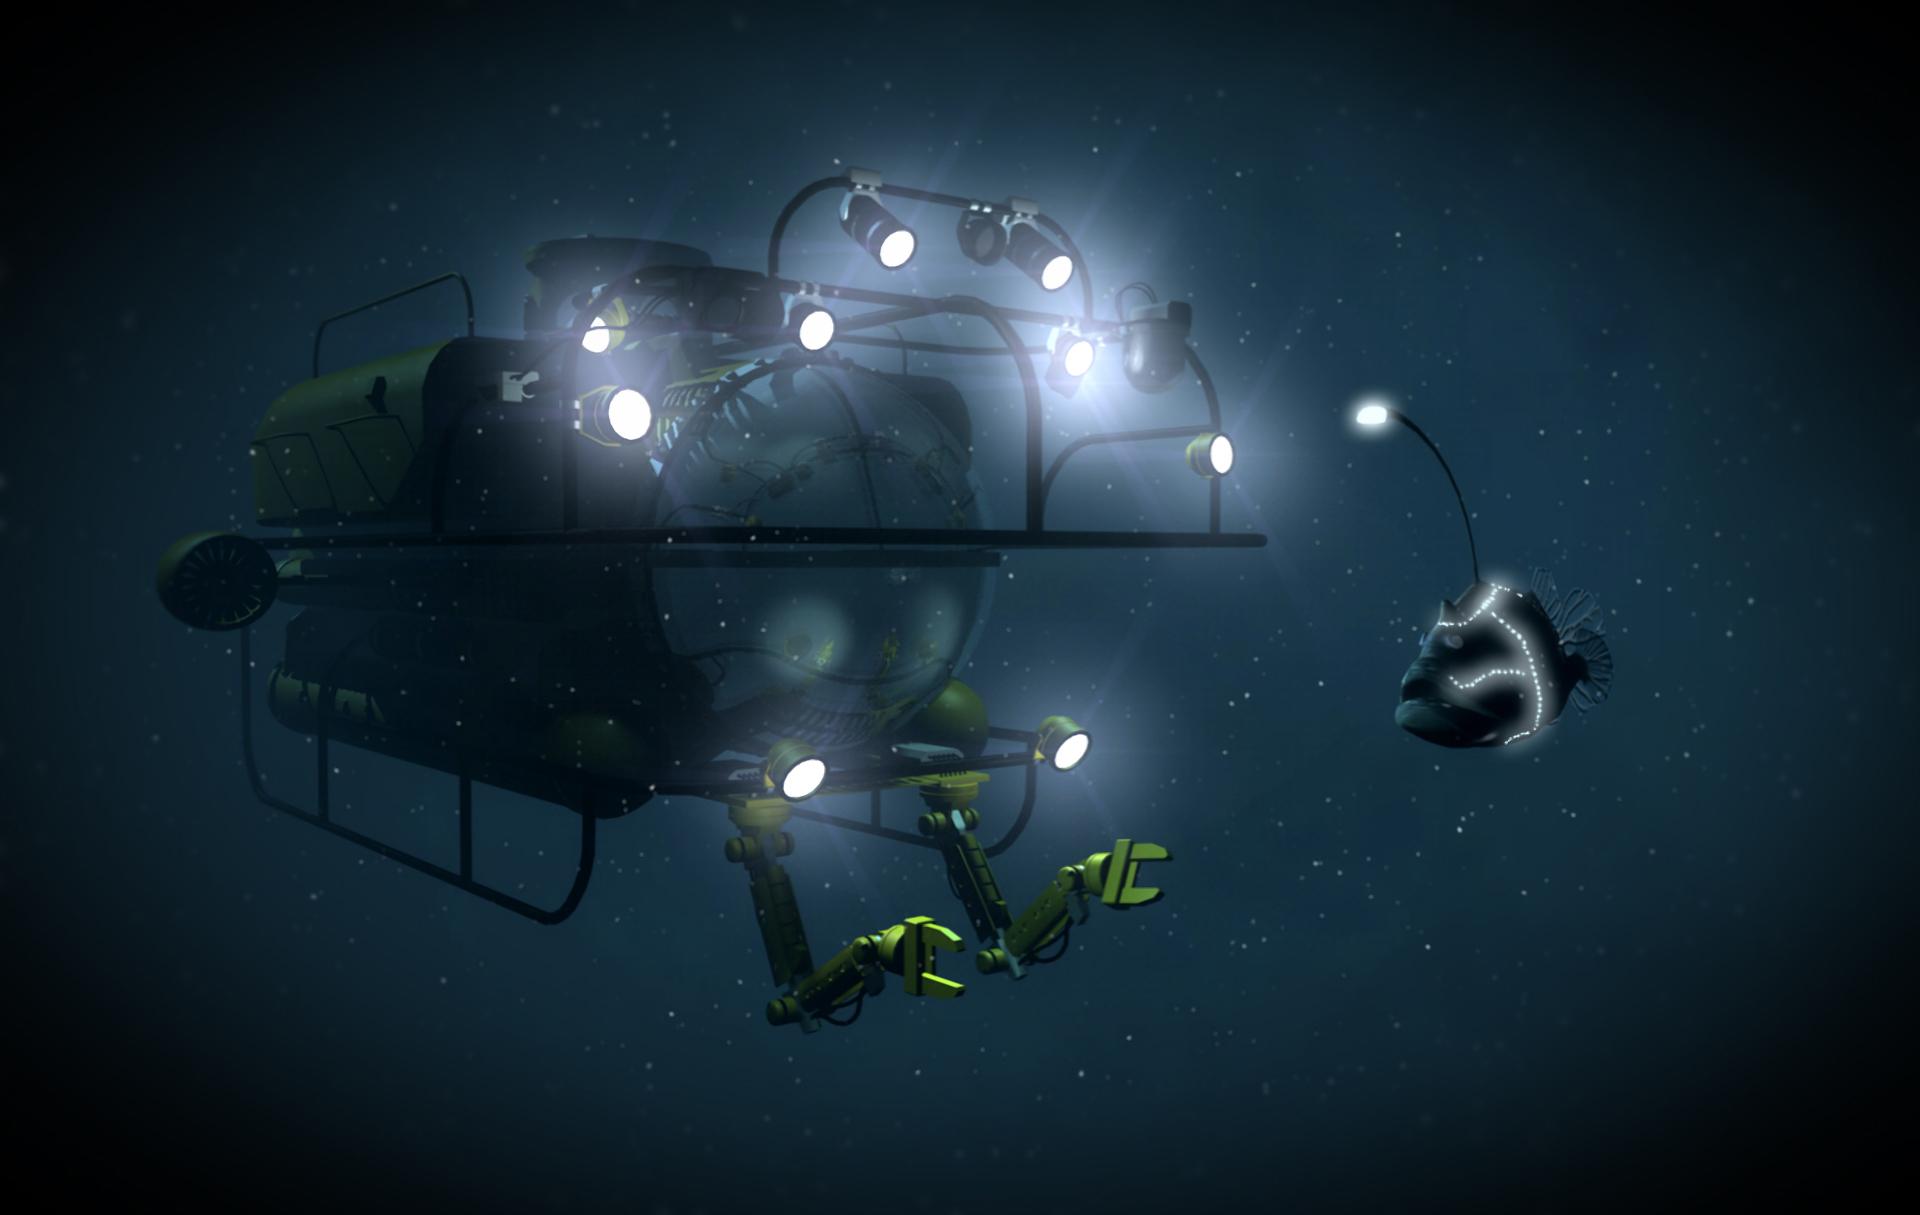 Deep Sea Encounter Desktop and mobile wallpaper Wallippo 1920x1215